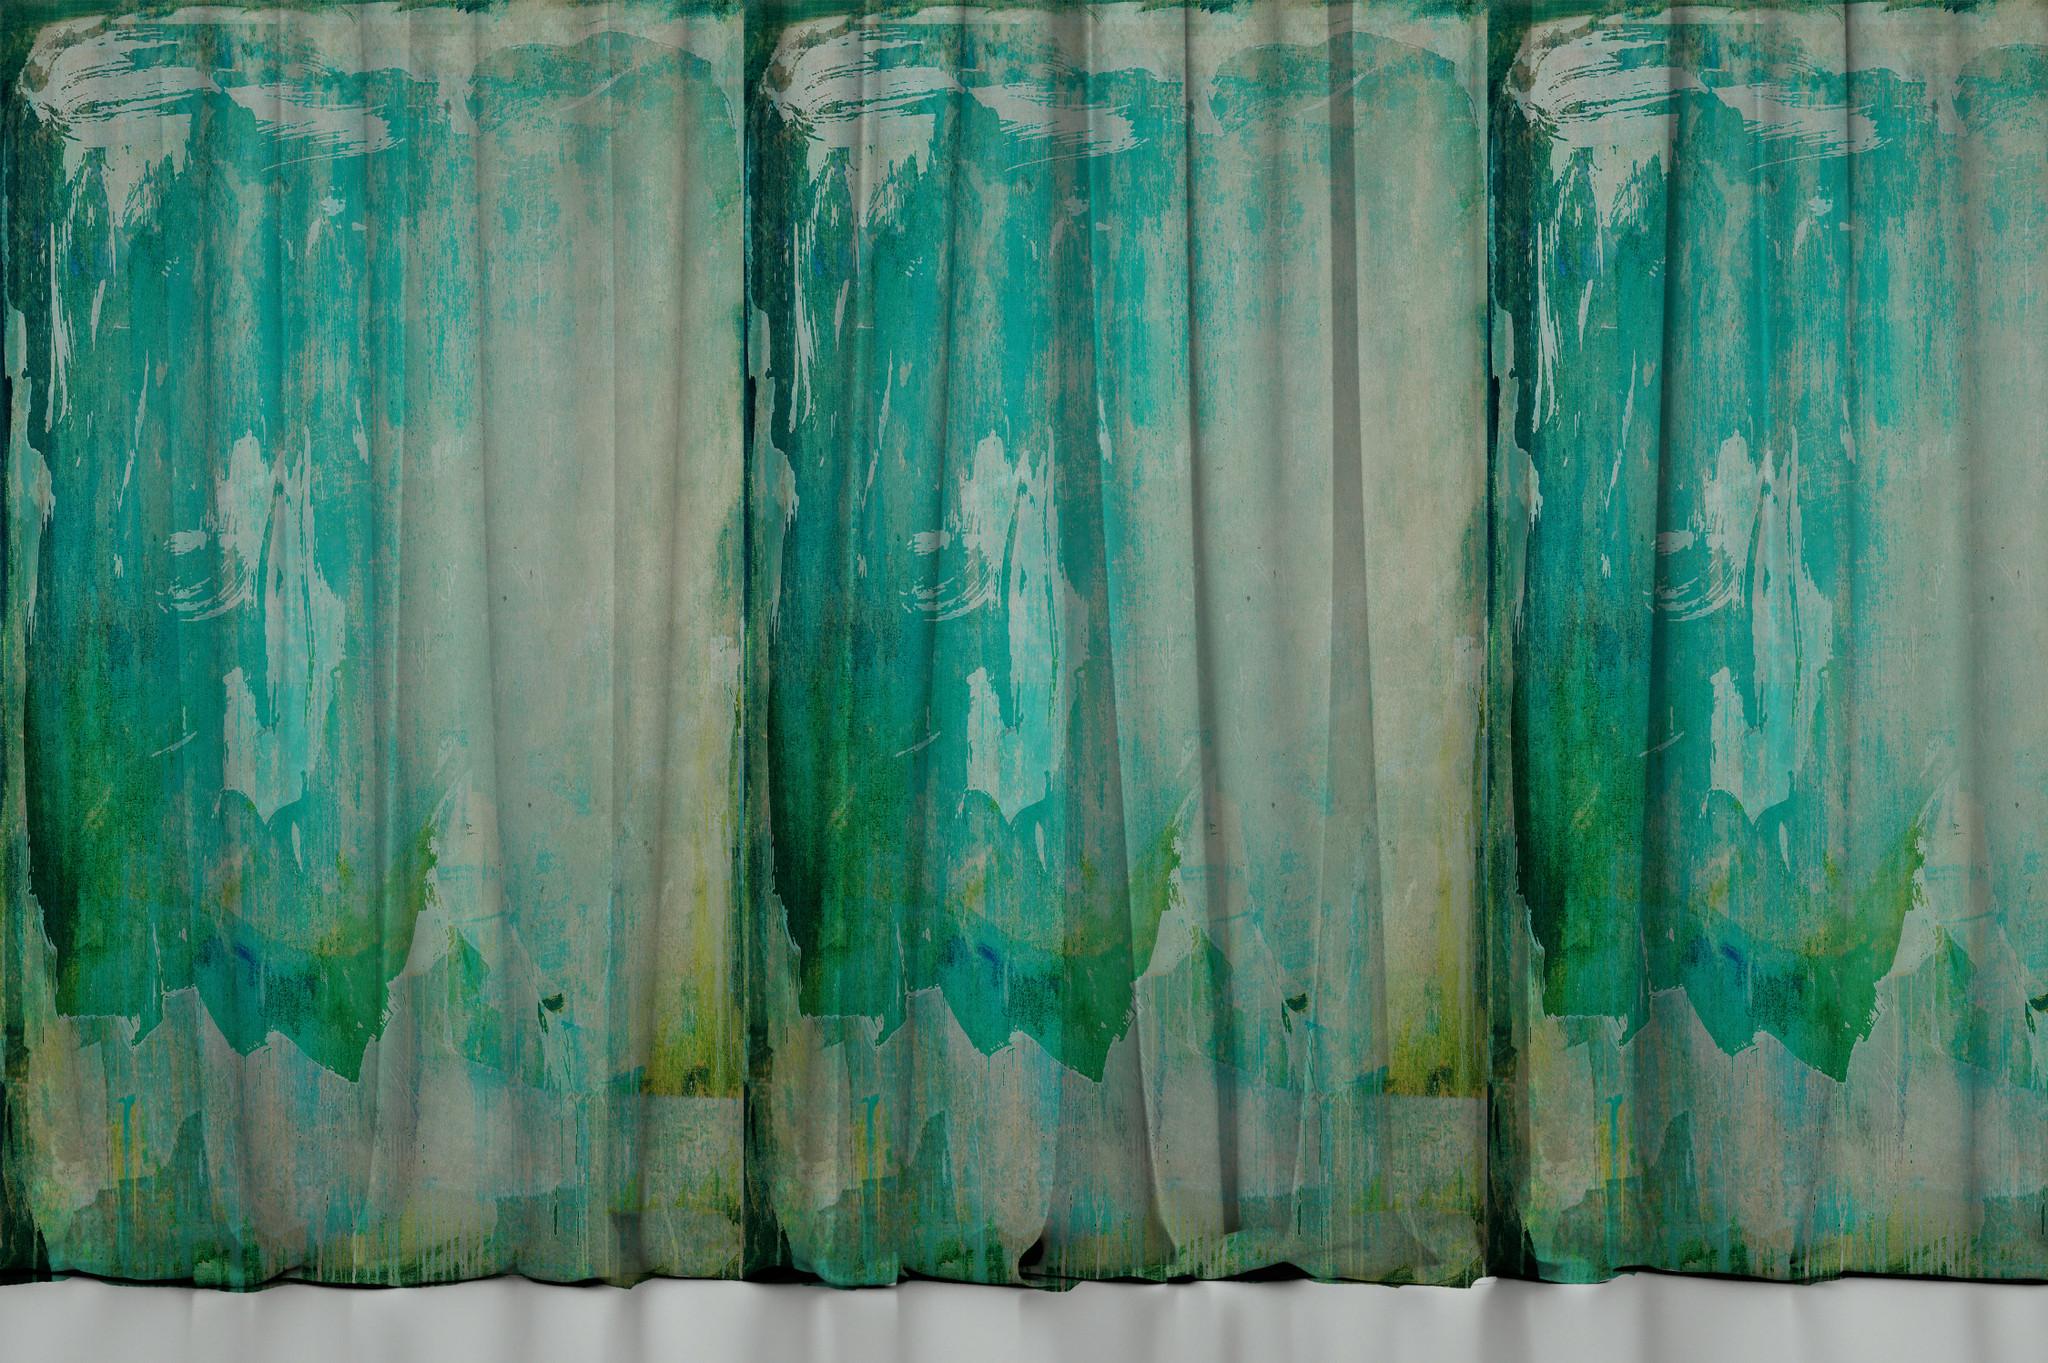 Fabric - Abstract - Urban Jungle